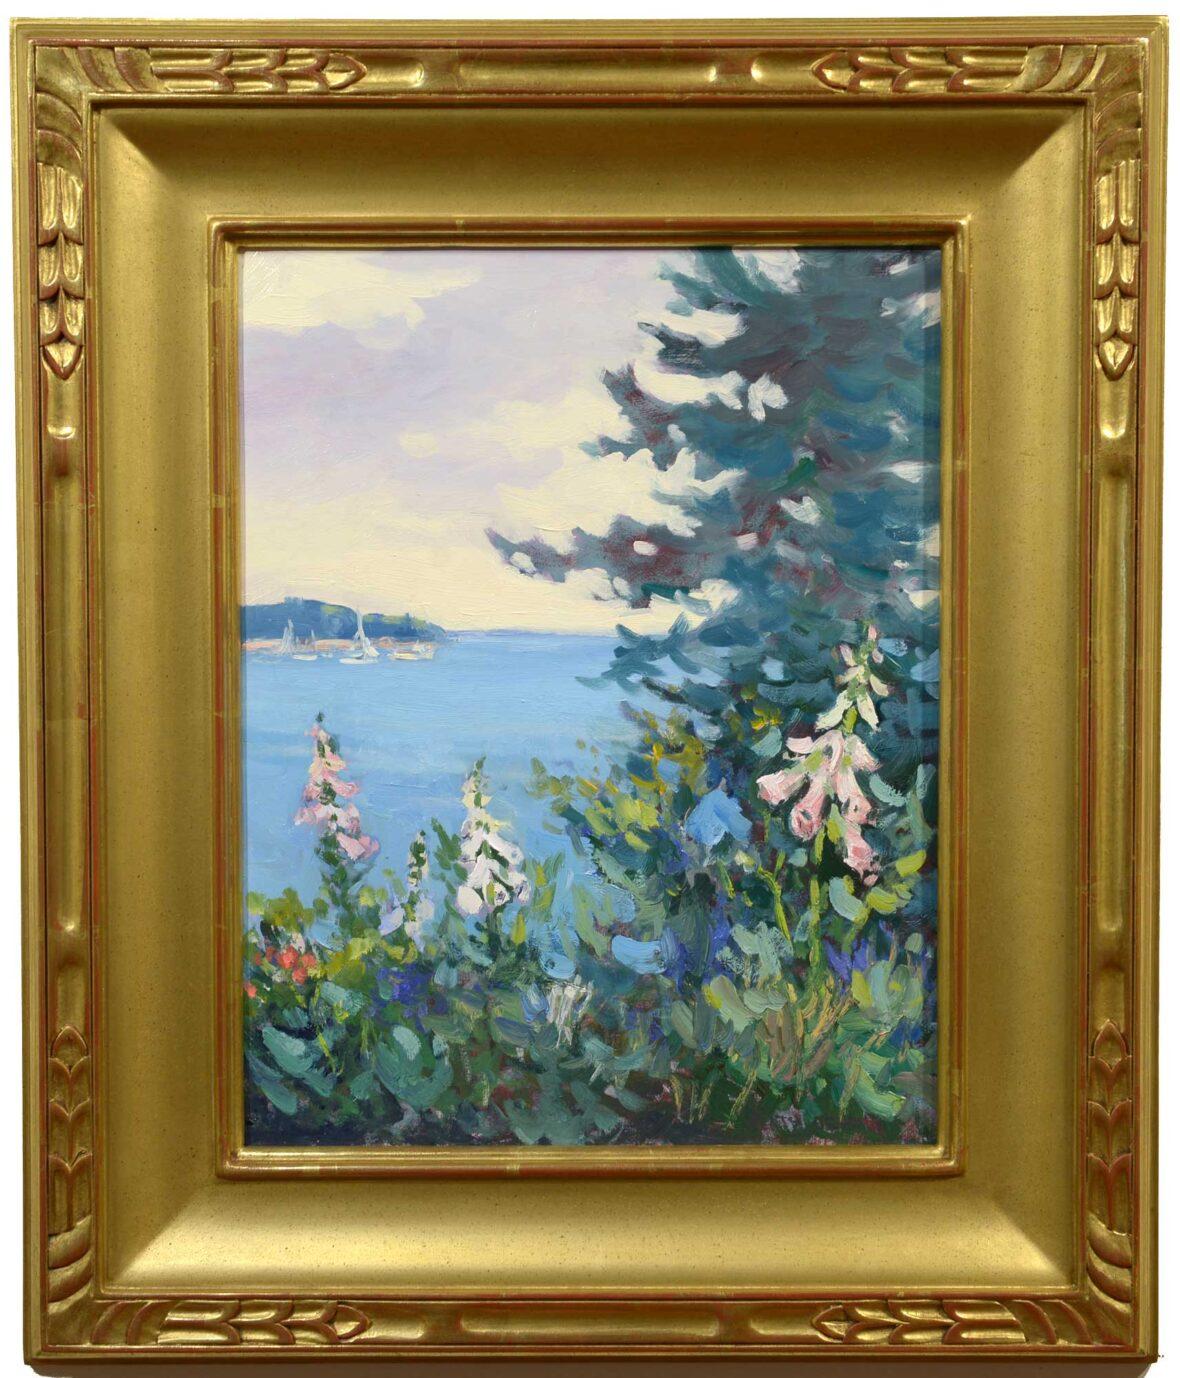 Keith Oehmig Summer Garden, Potts Point framed